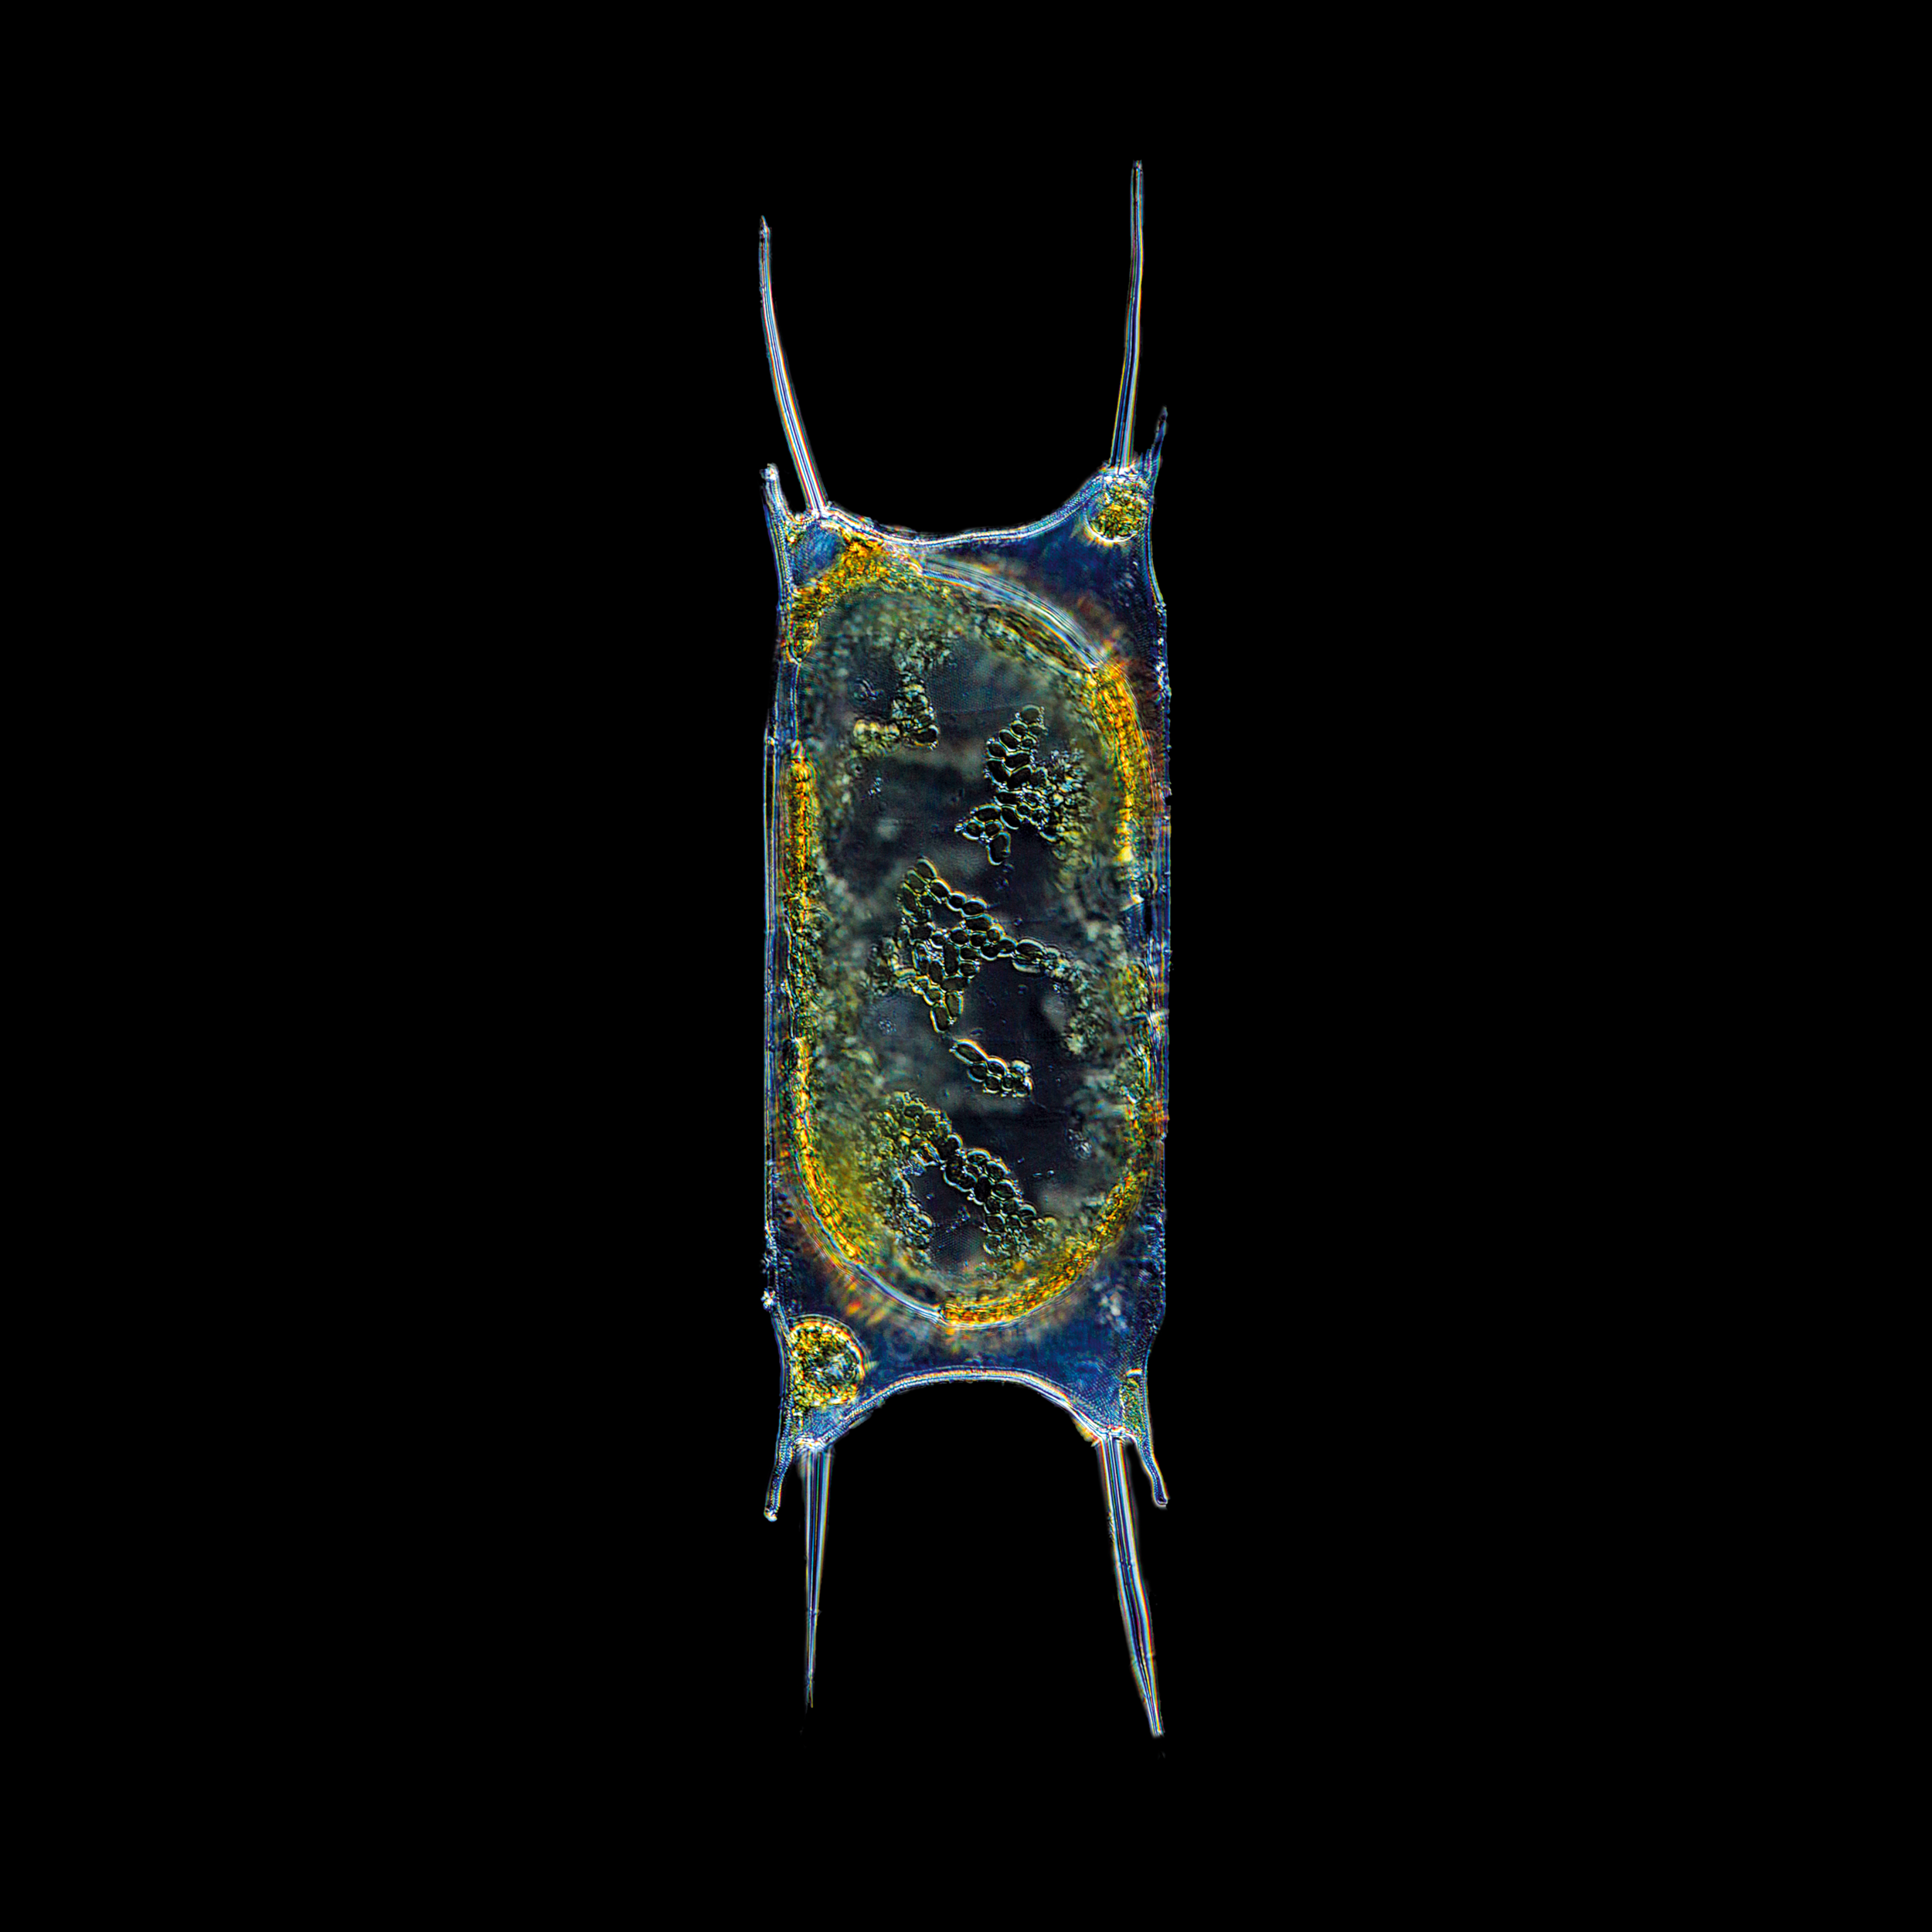 Christian Sardet and The Macronauts   Odontella sinensis diatom.  Bay of Roscoff, France. 2012   ©  Christian Sardet and The Macronauts / Plankton Chronicles Project